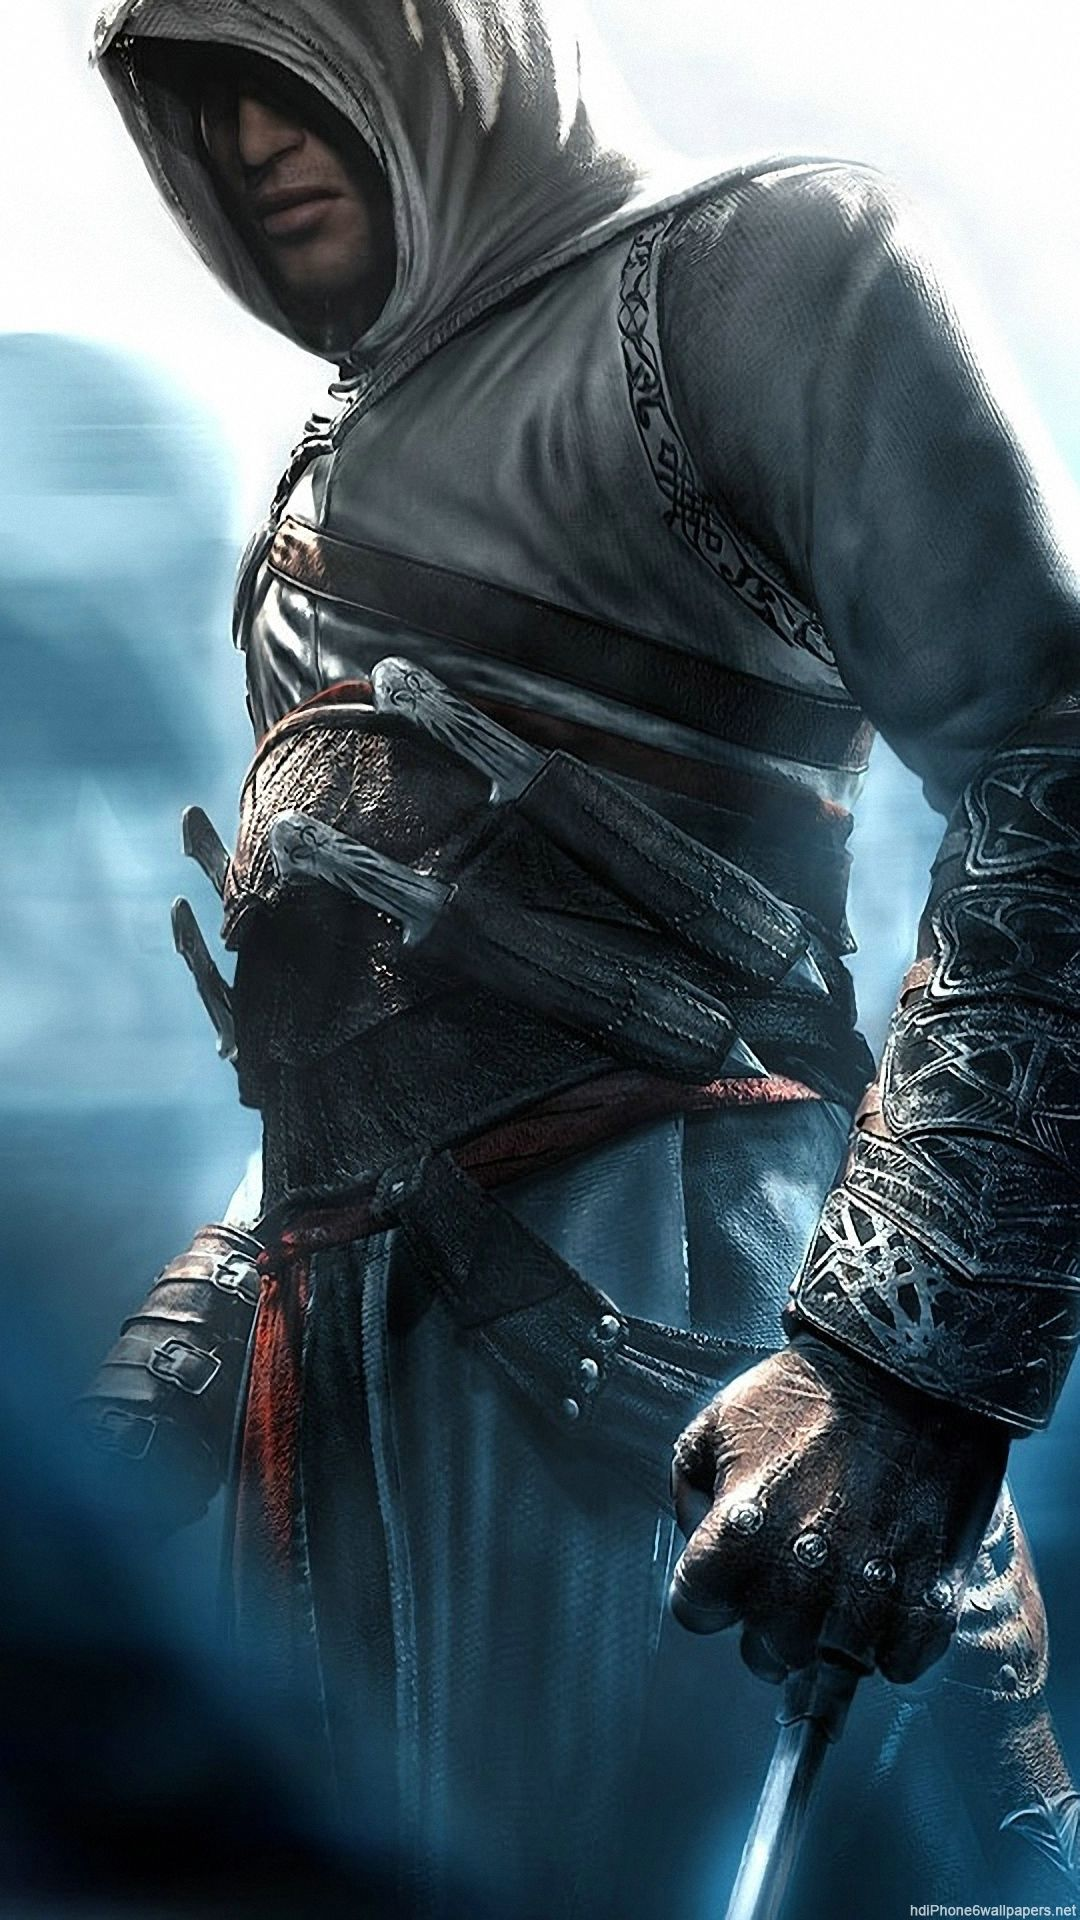 Assassin's Creed iPhone Wallpaper Best iPhone Wallpaper